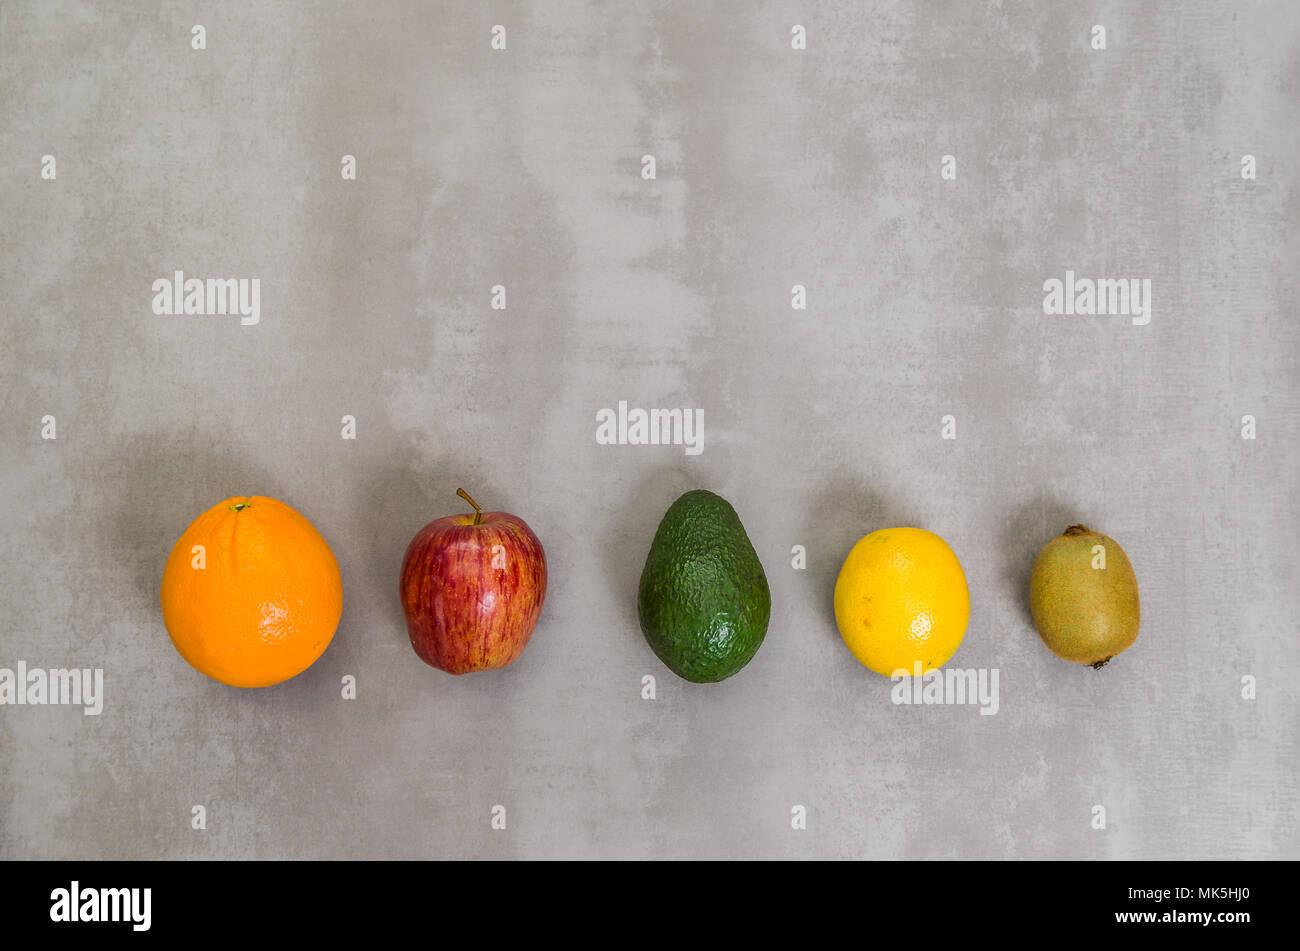 Great concept of healthy eating, various fruits on gray background, polished concrete. Orange, apple, kiwi, lemon. - Stock Image